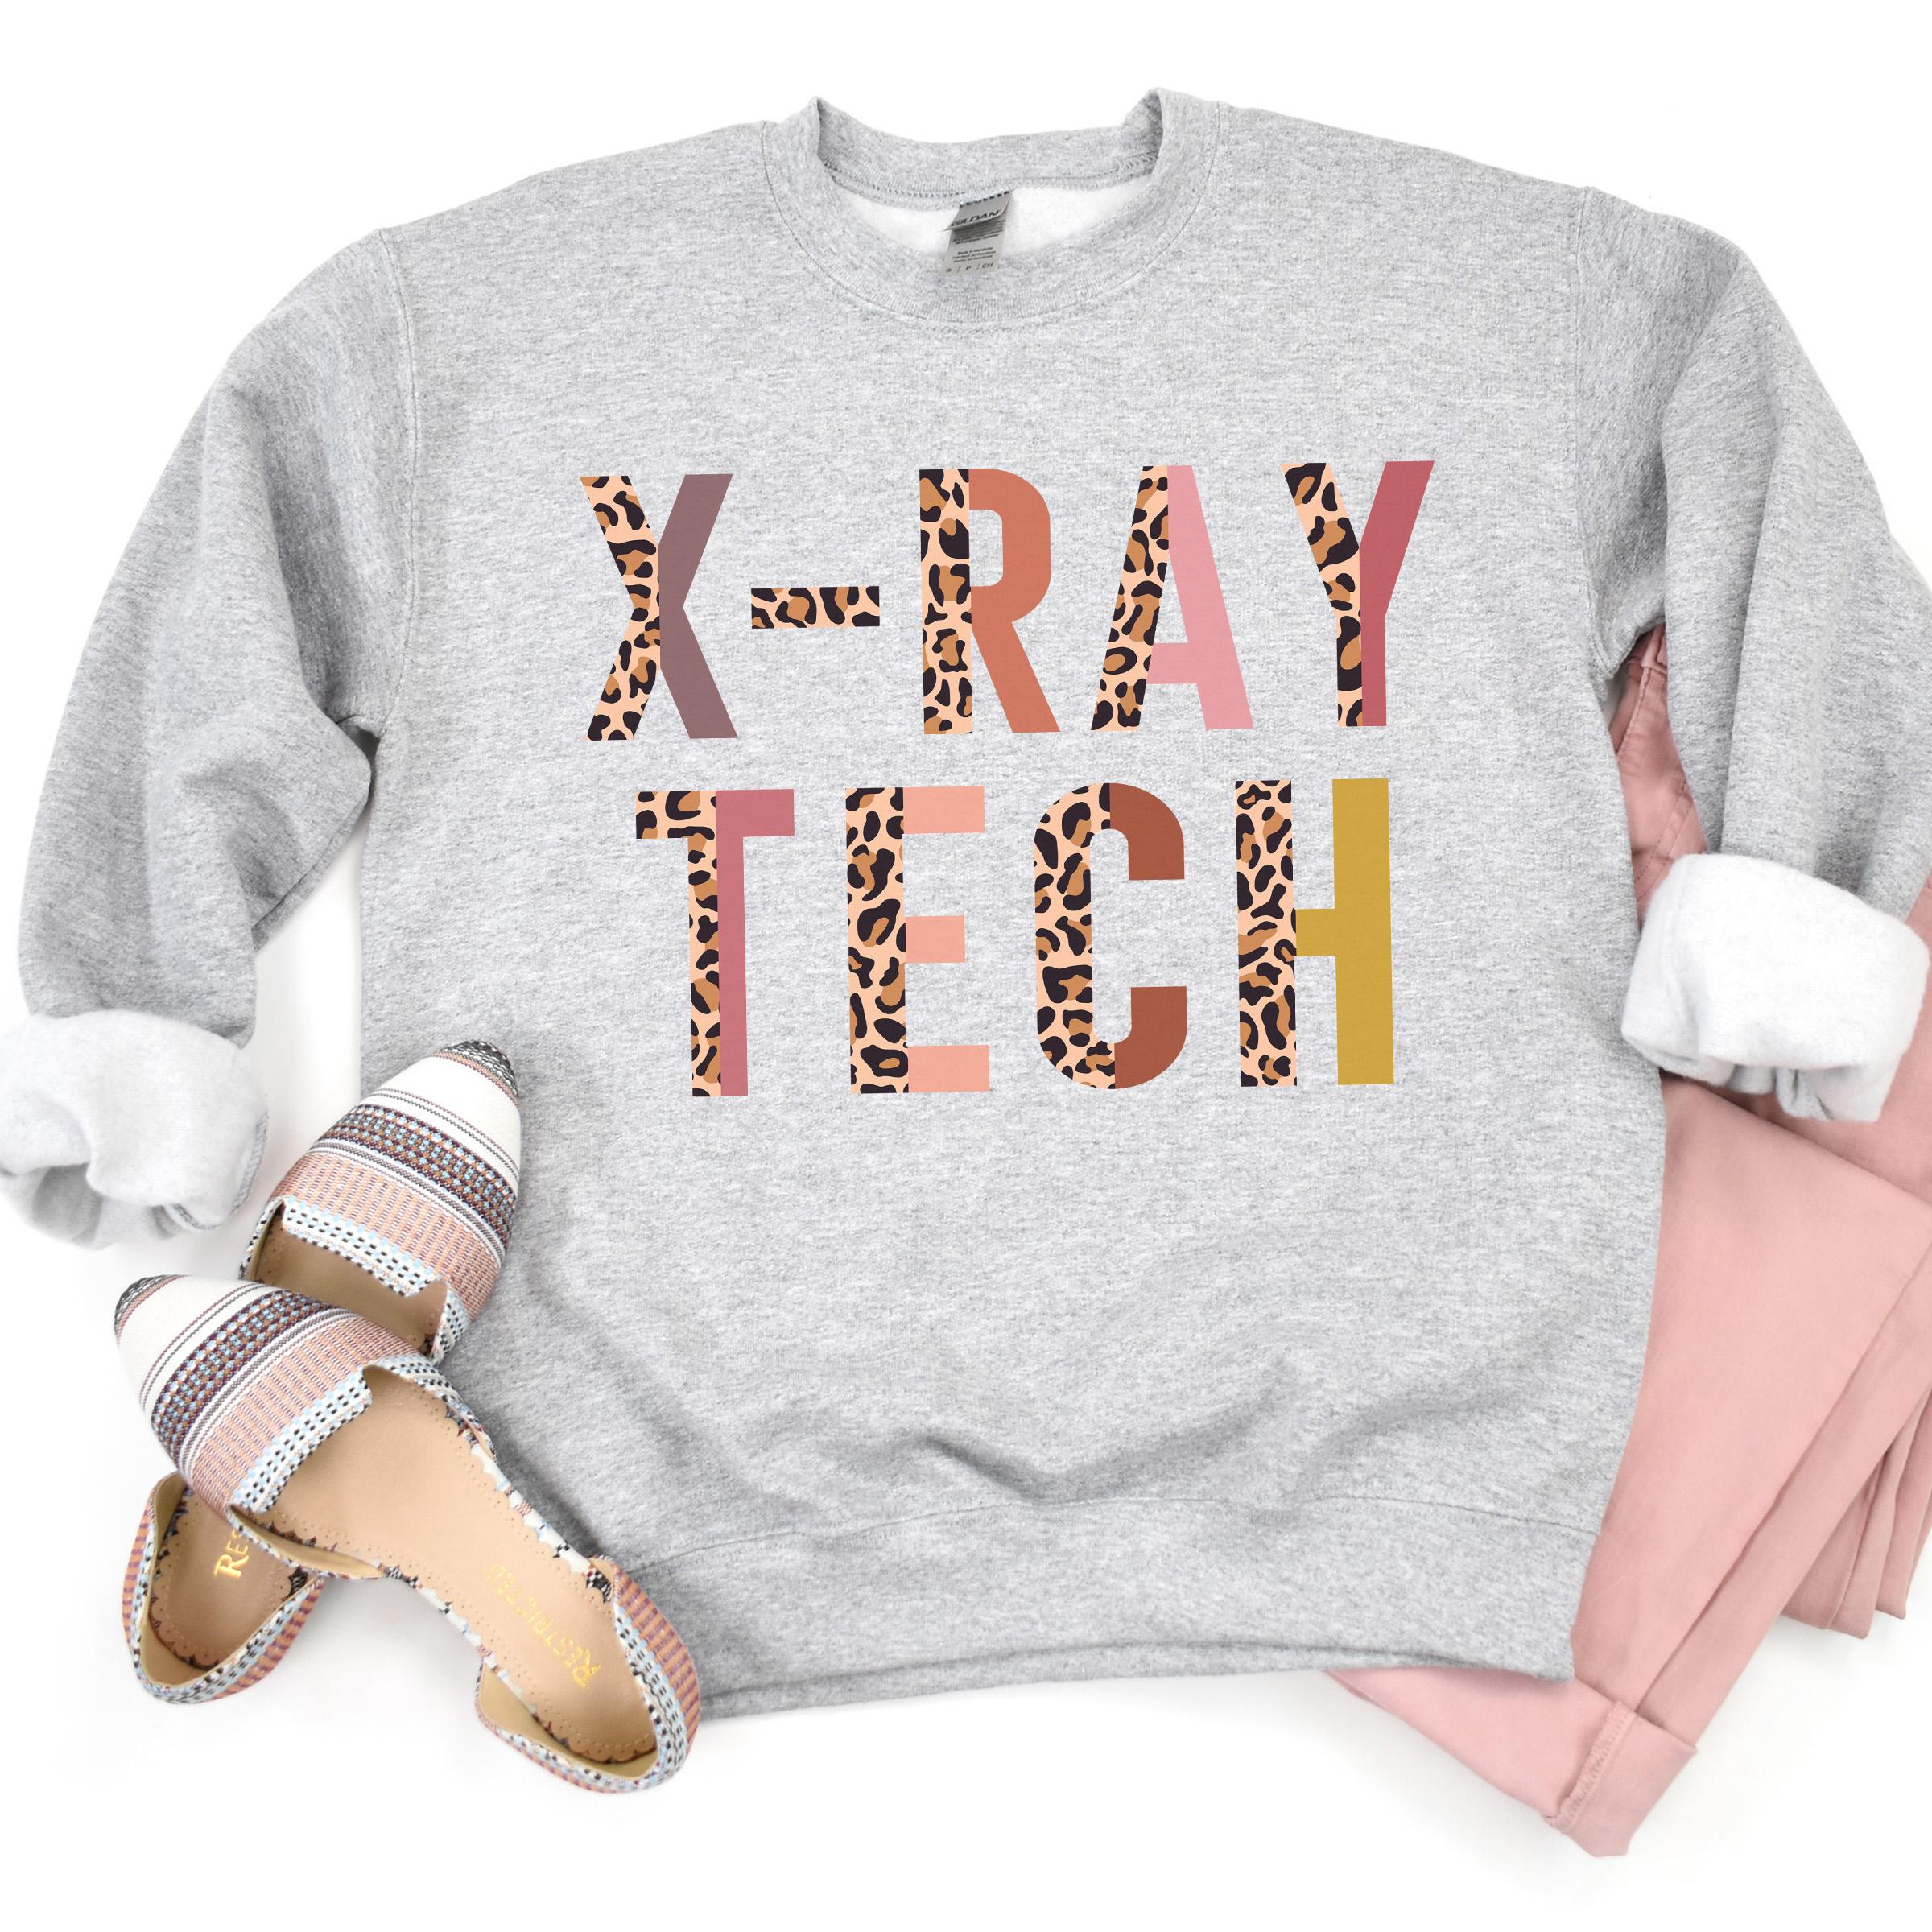 Xray Tech   Leopard Print Sweatshirt   Xray Technologist   Xray Technician  Medical Imaging   Medical Radiation   Unisex Crewneck Sweatshirt